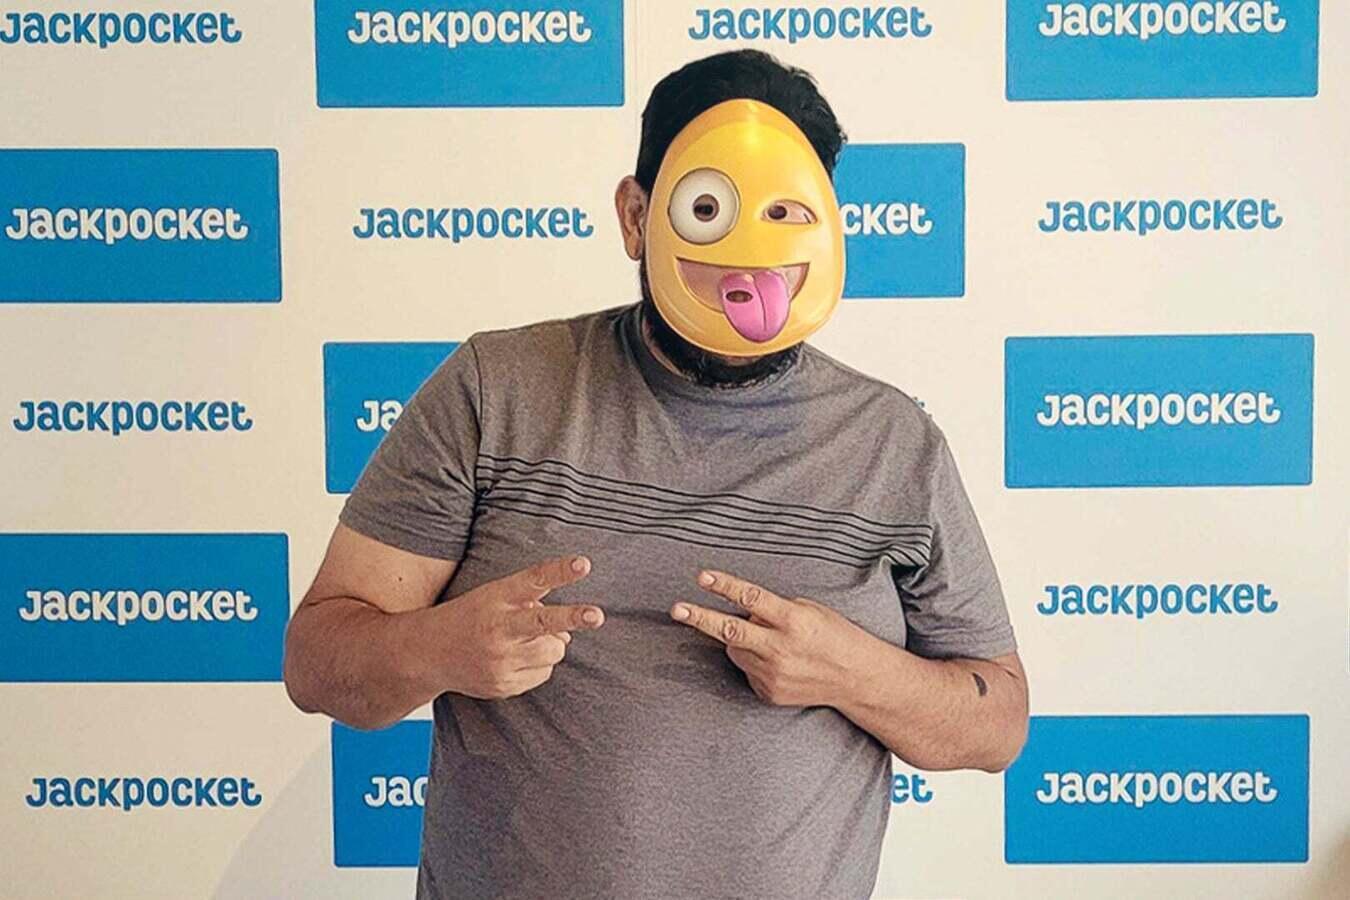 Jaime won the Texas Two Step jackpot on Jackpocket